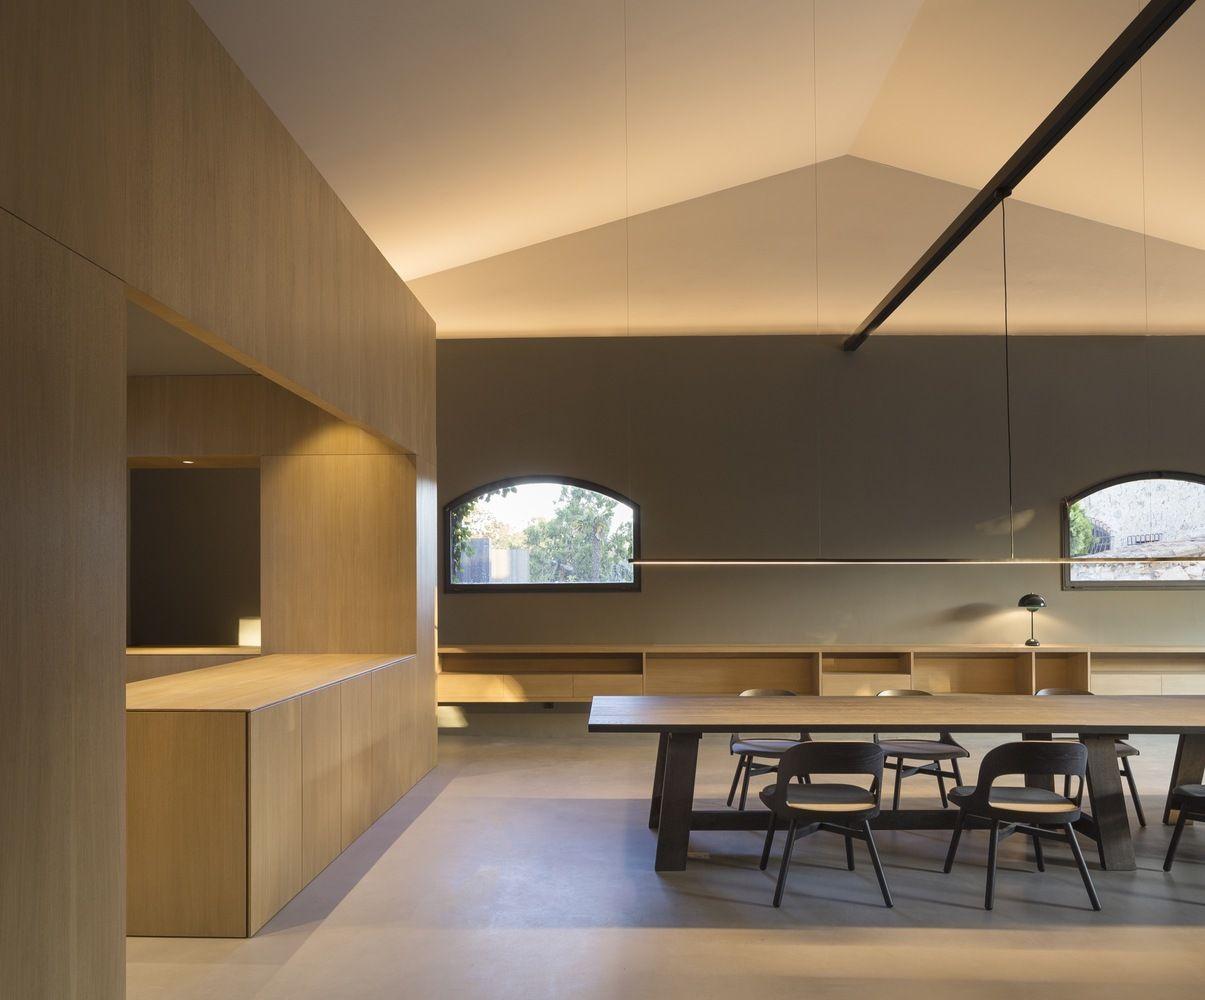 Gallery of Sant Martí House / Francesc Rifé Studio - 6   Pinterest